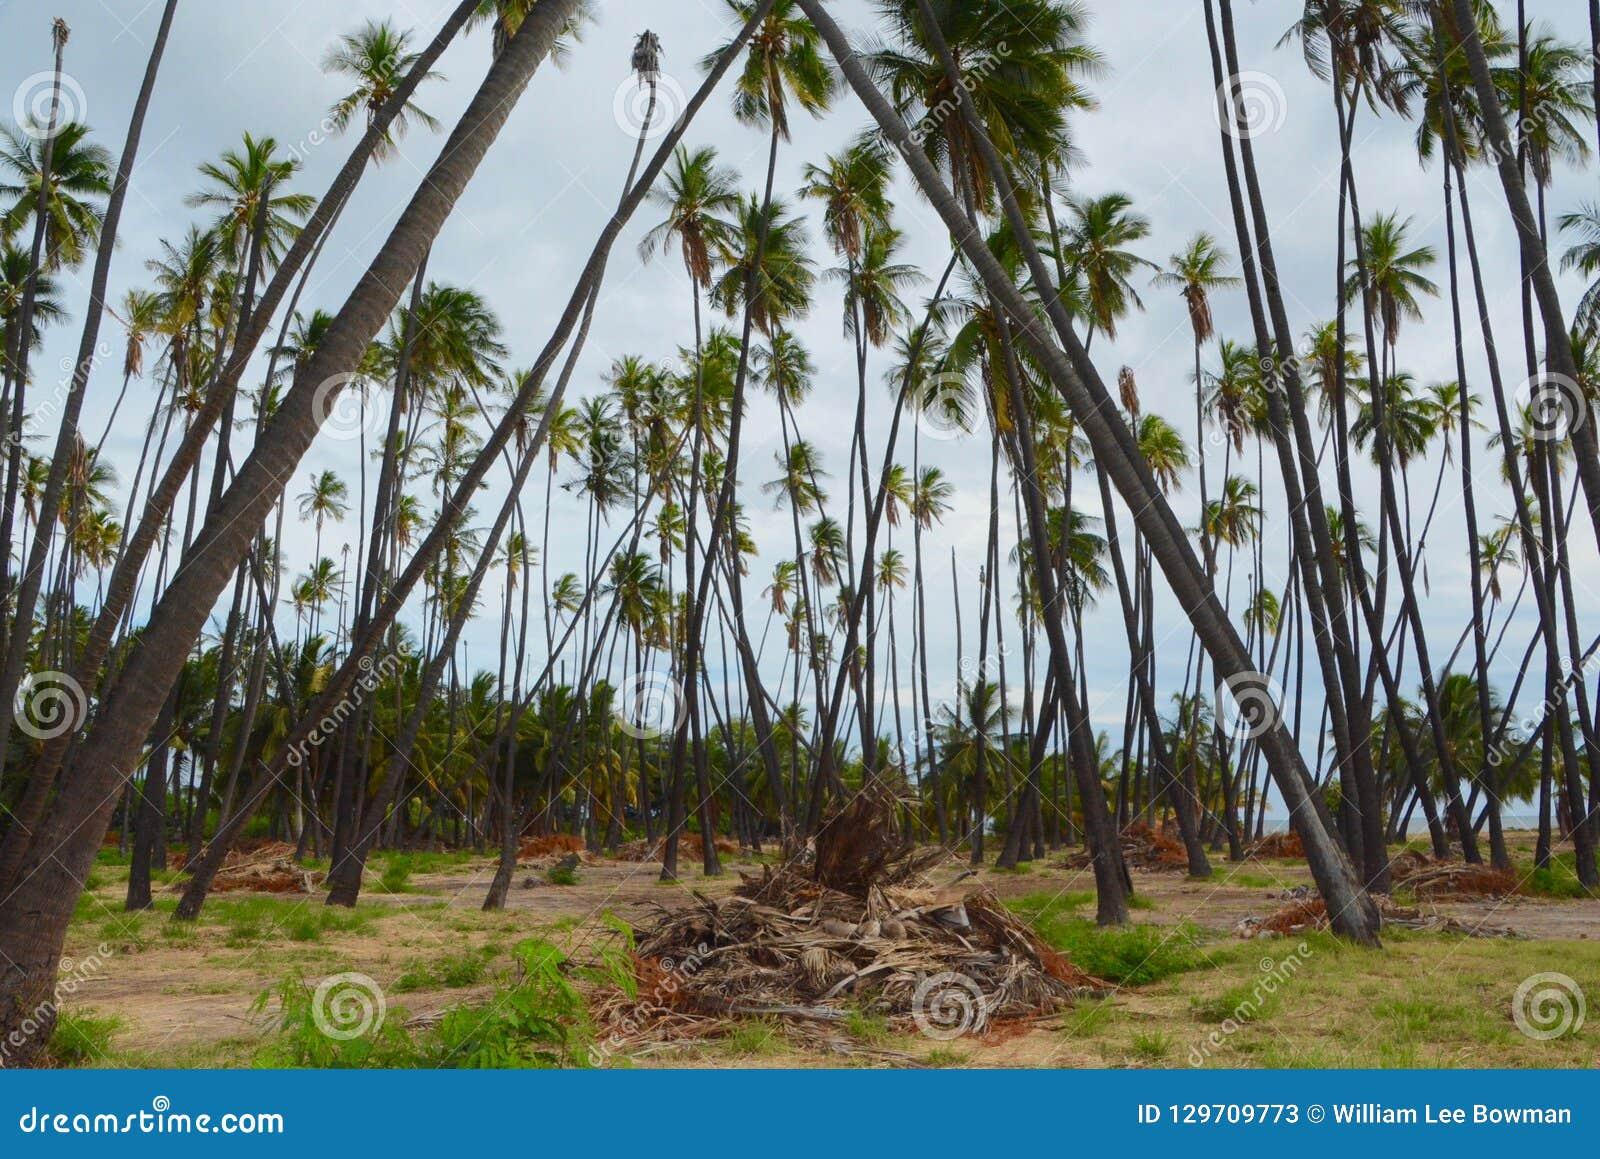 Kapuaiwa莫洛凯区的椰子树丛